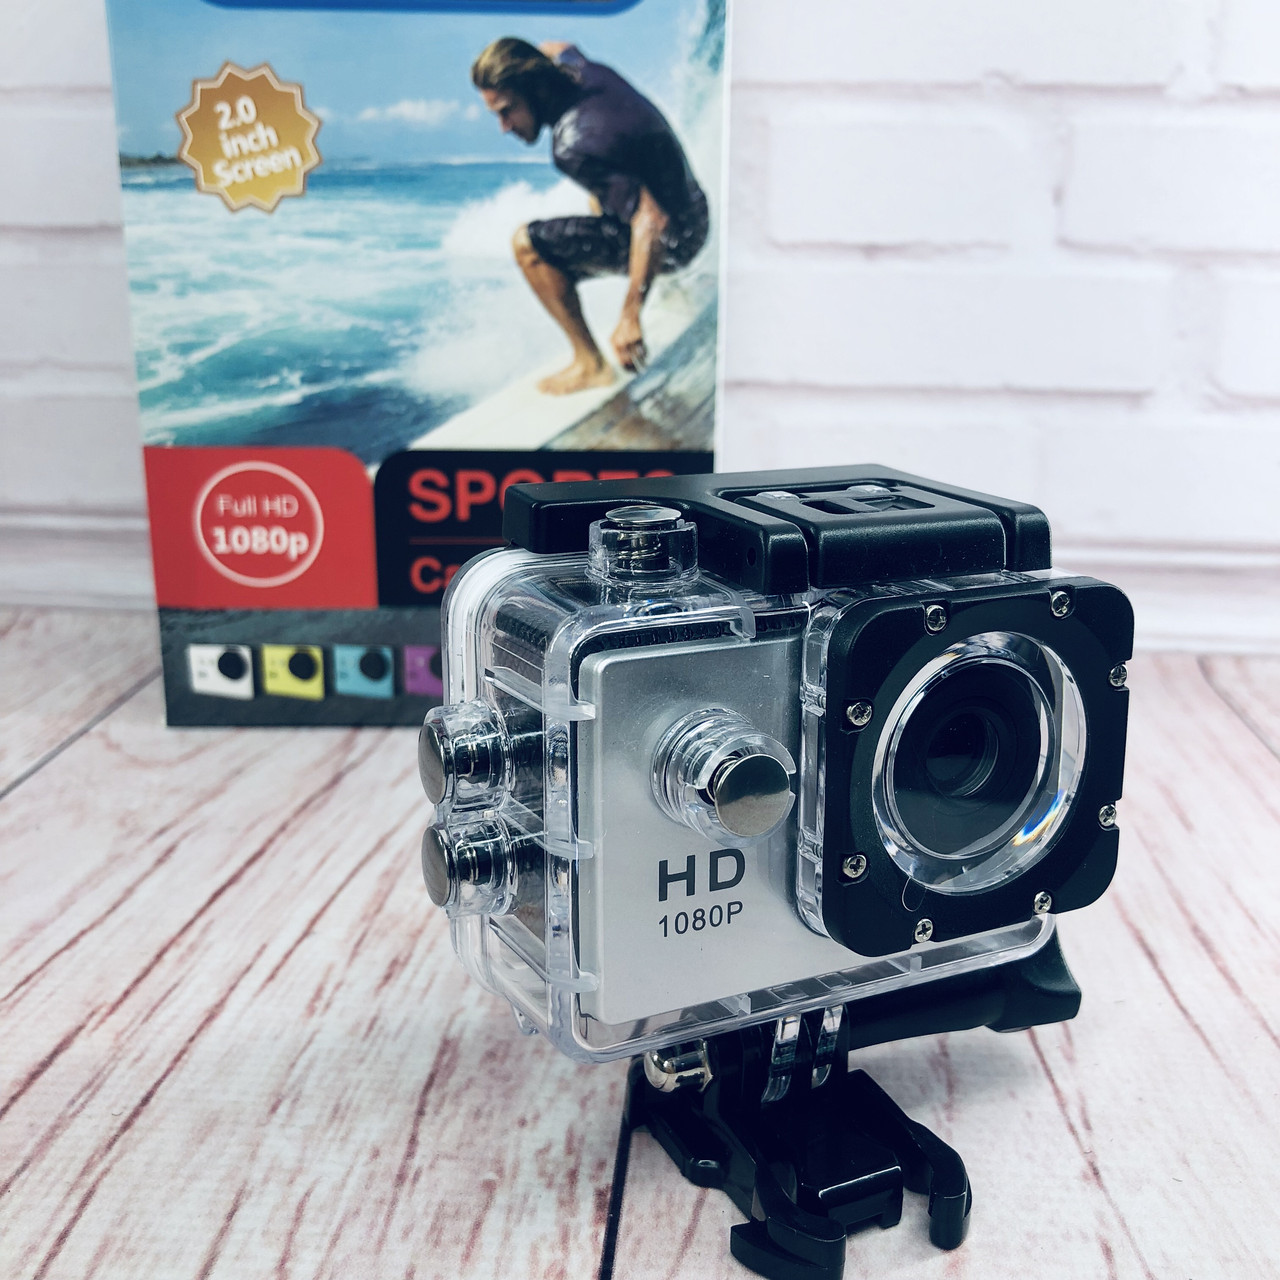 Экшн-камера А7 Sports Full HD 1080P (цвет серебро)